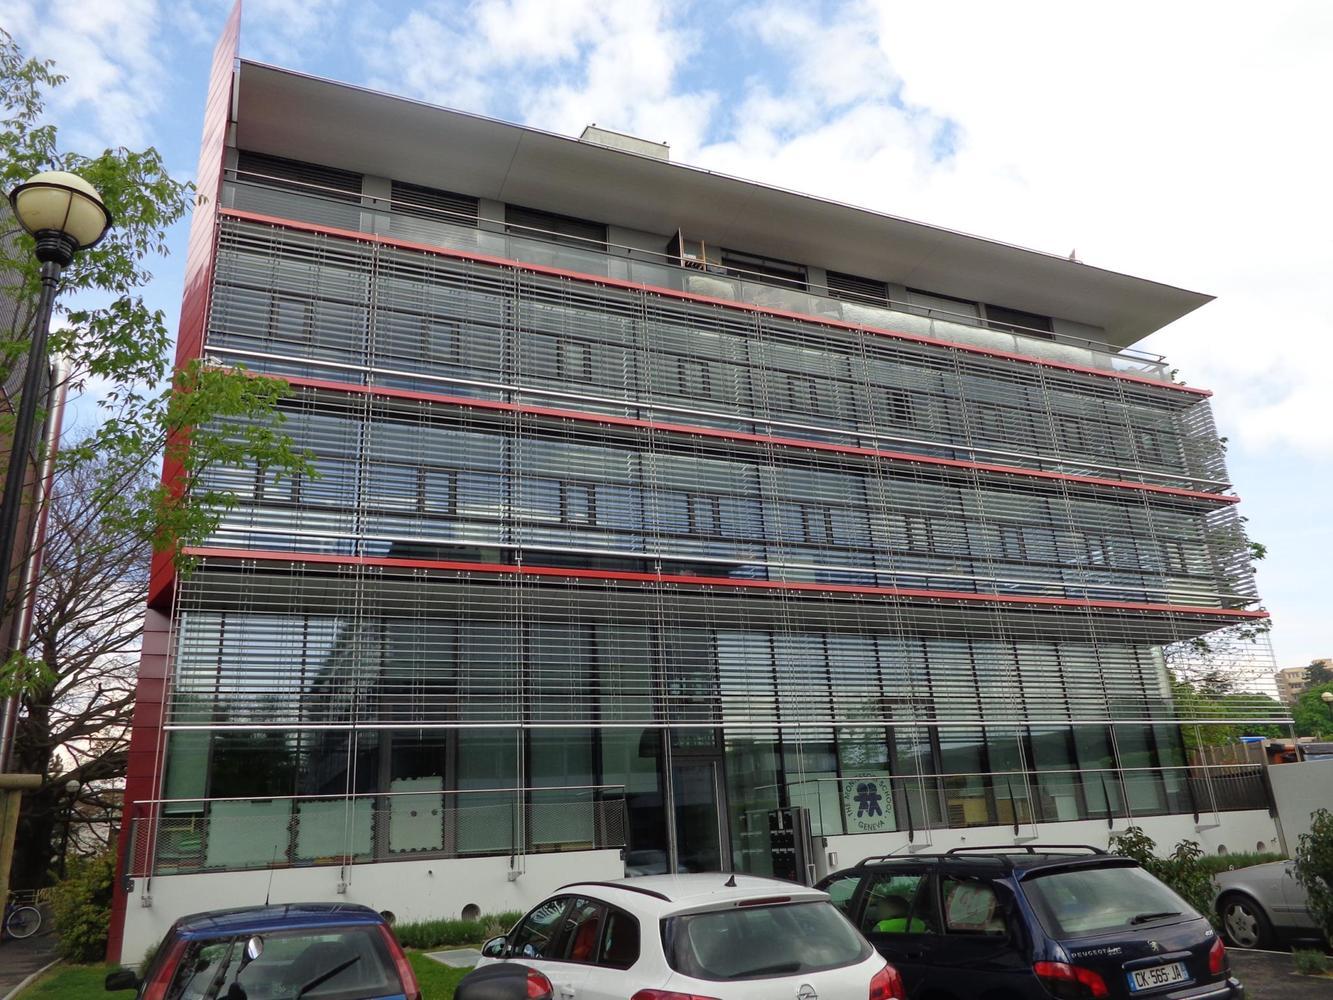 Gerofinance bureau lumineux denv. 207 m2 dans immeuble moderne